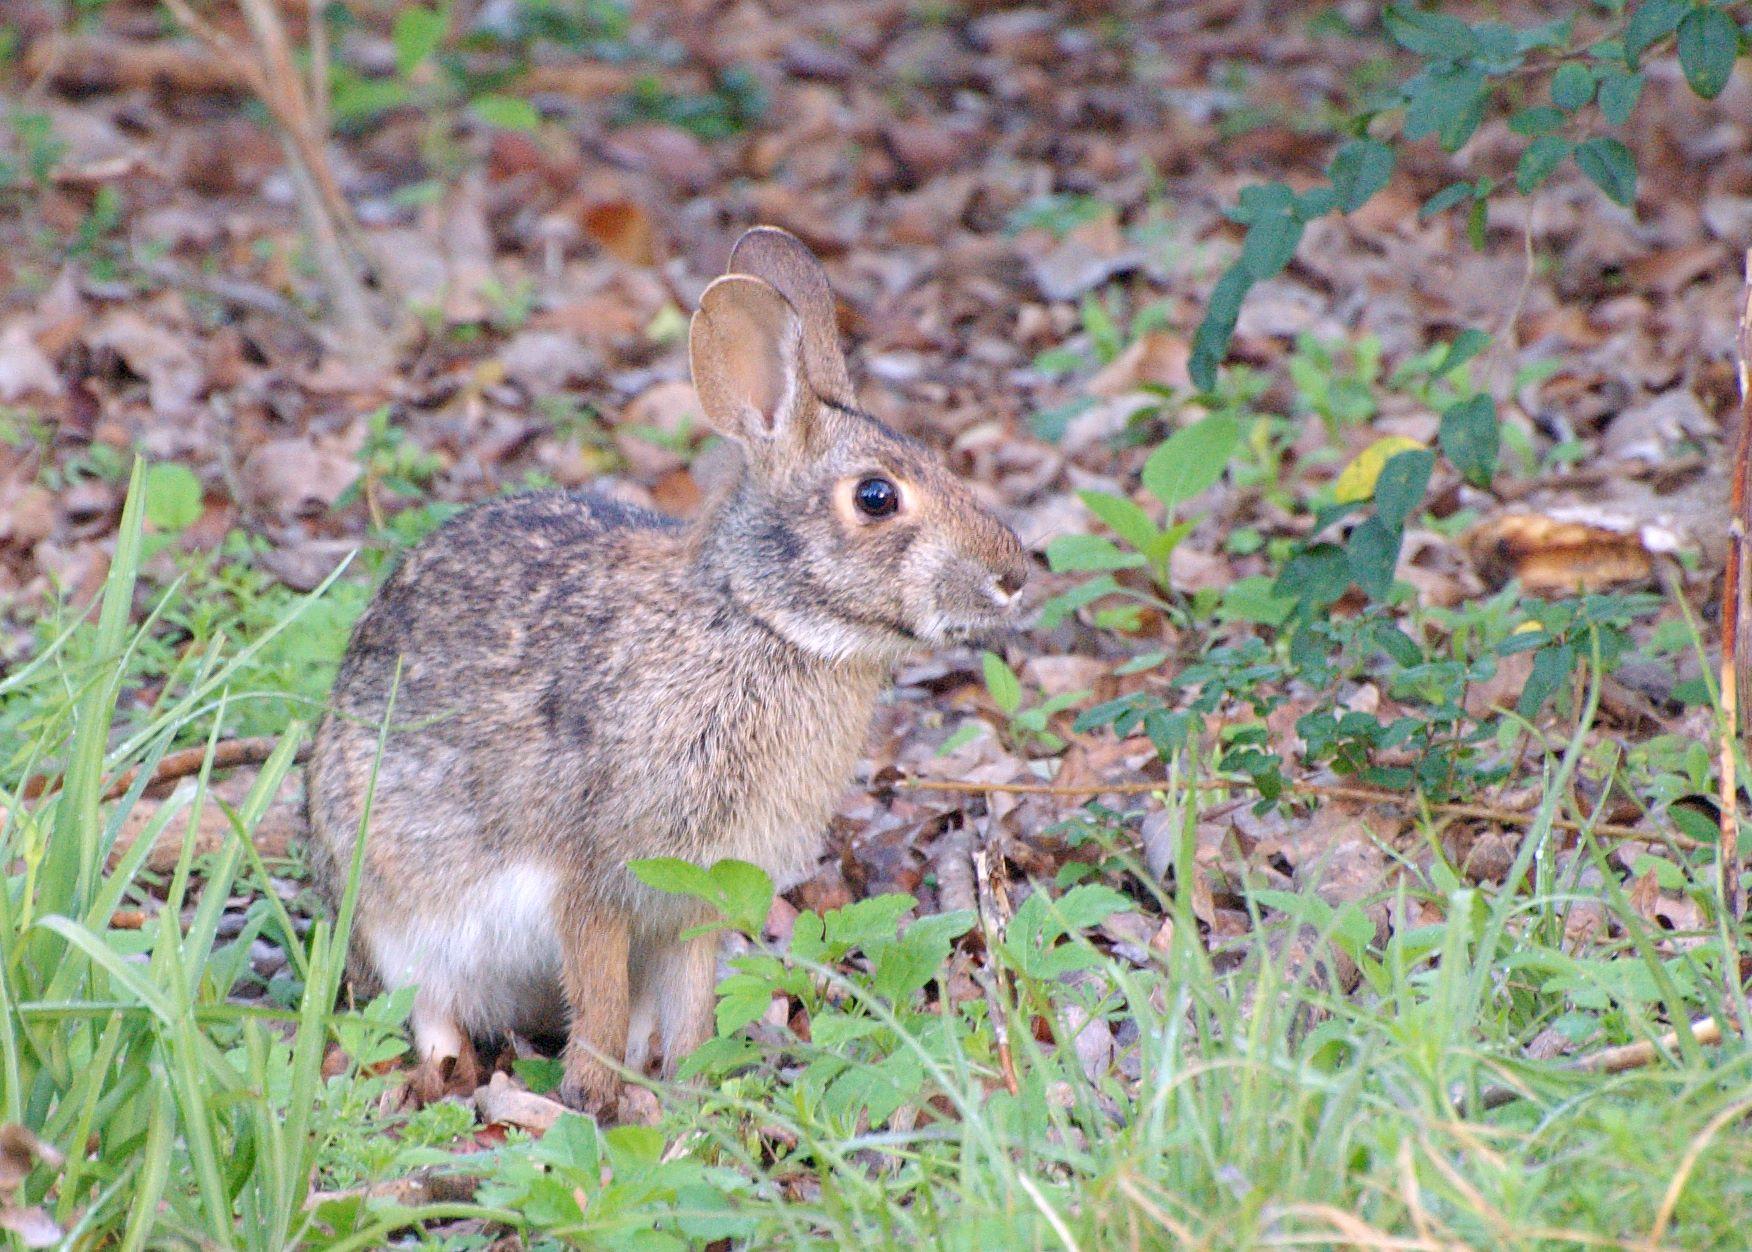 Swamp rabbit - Wikipedia